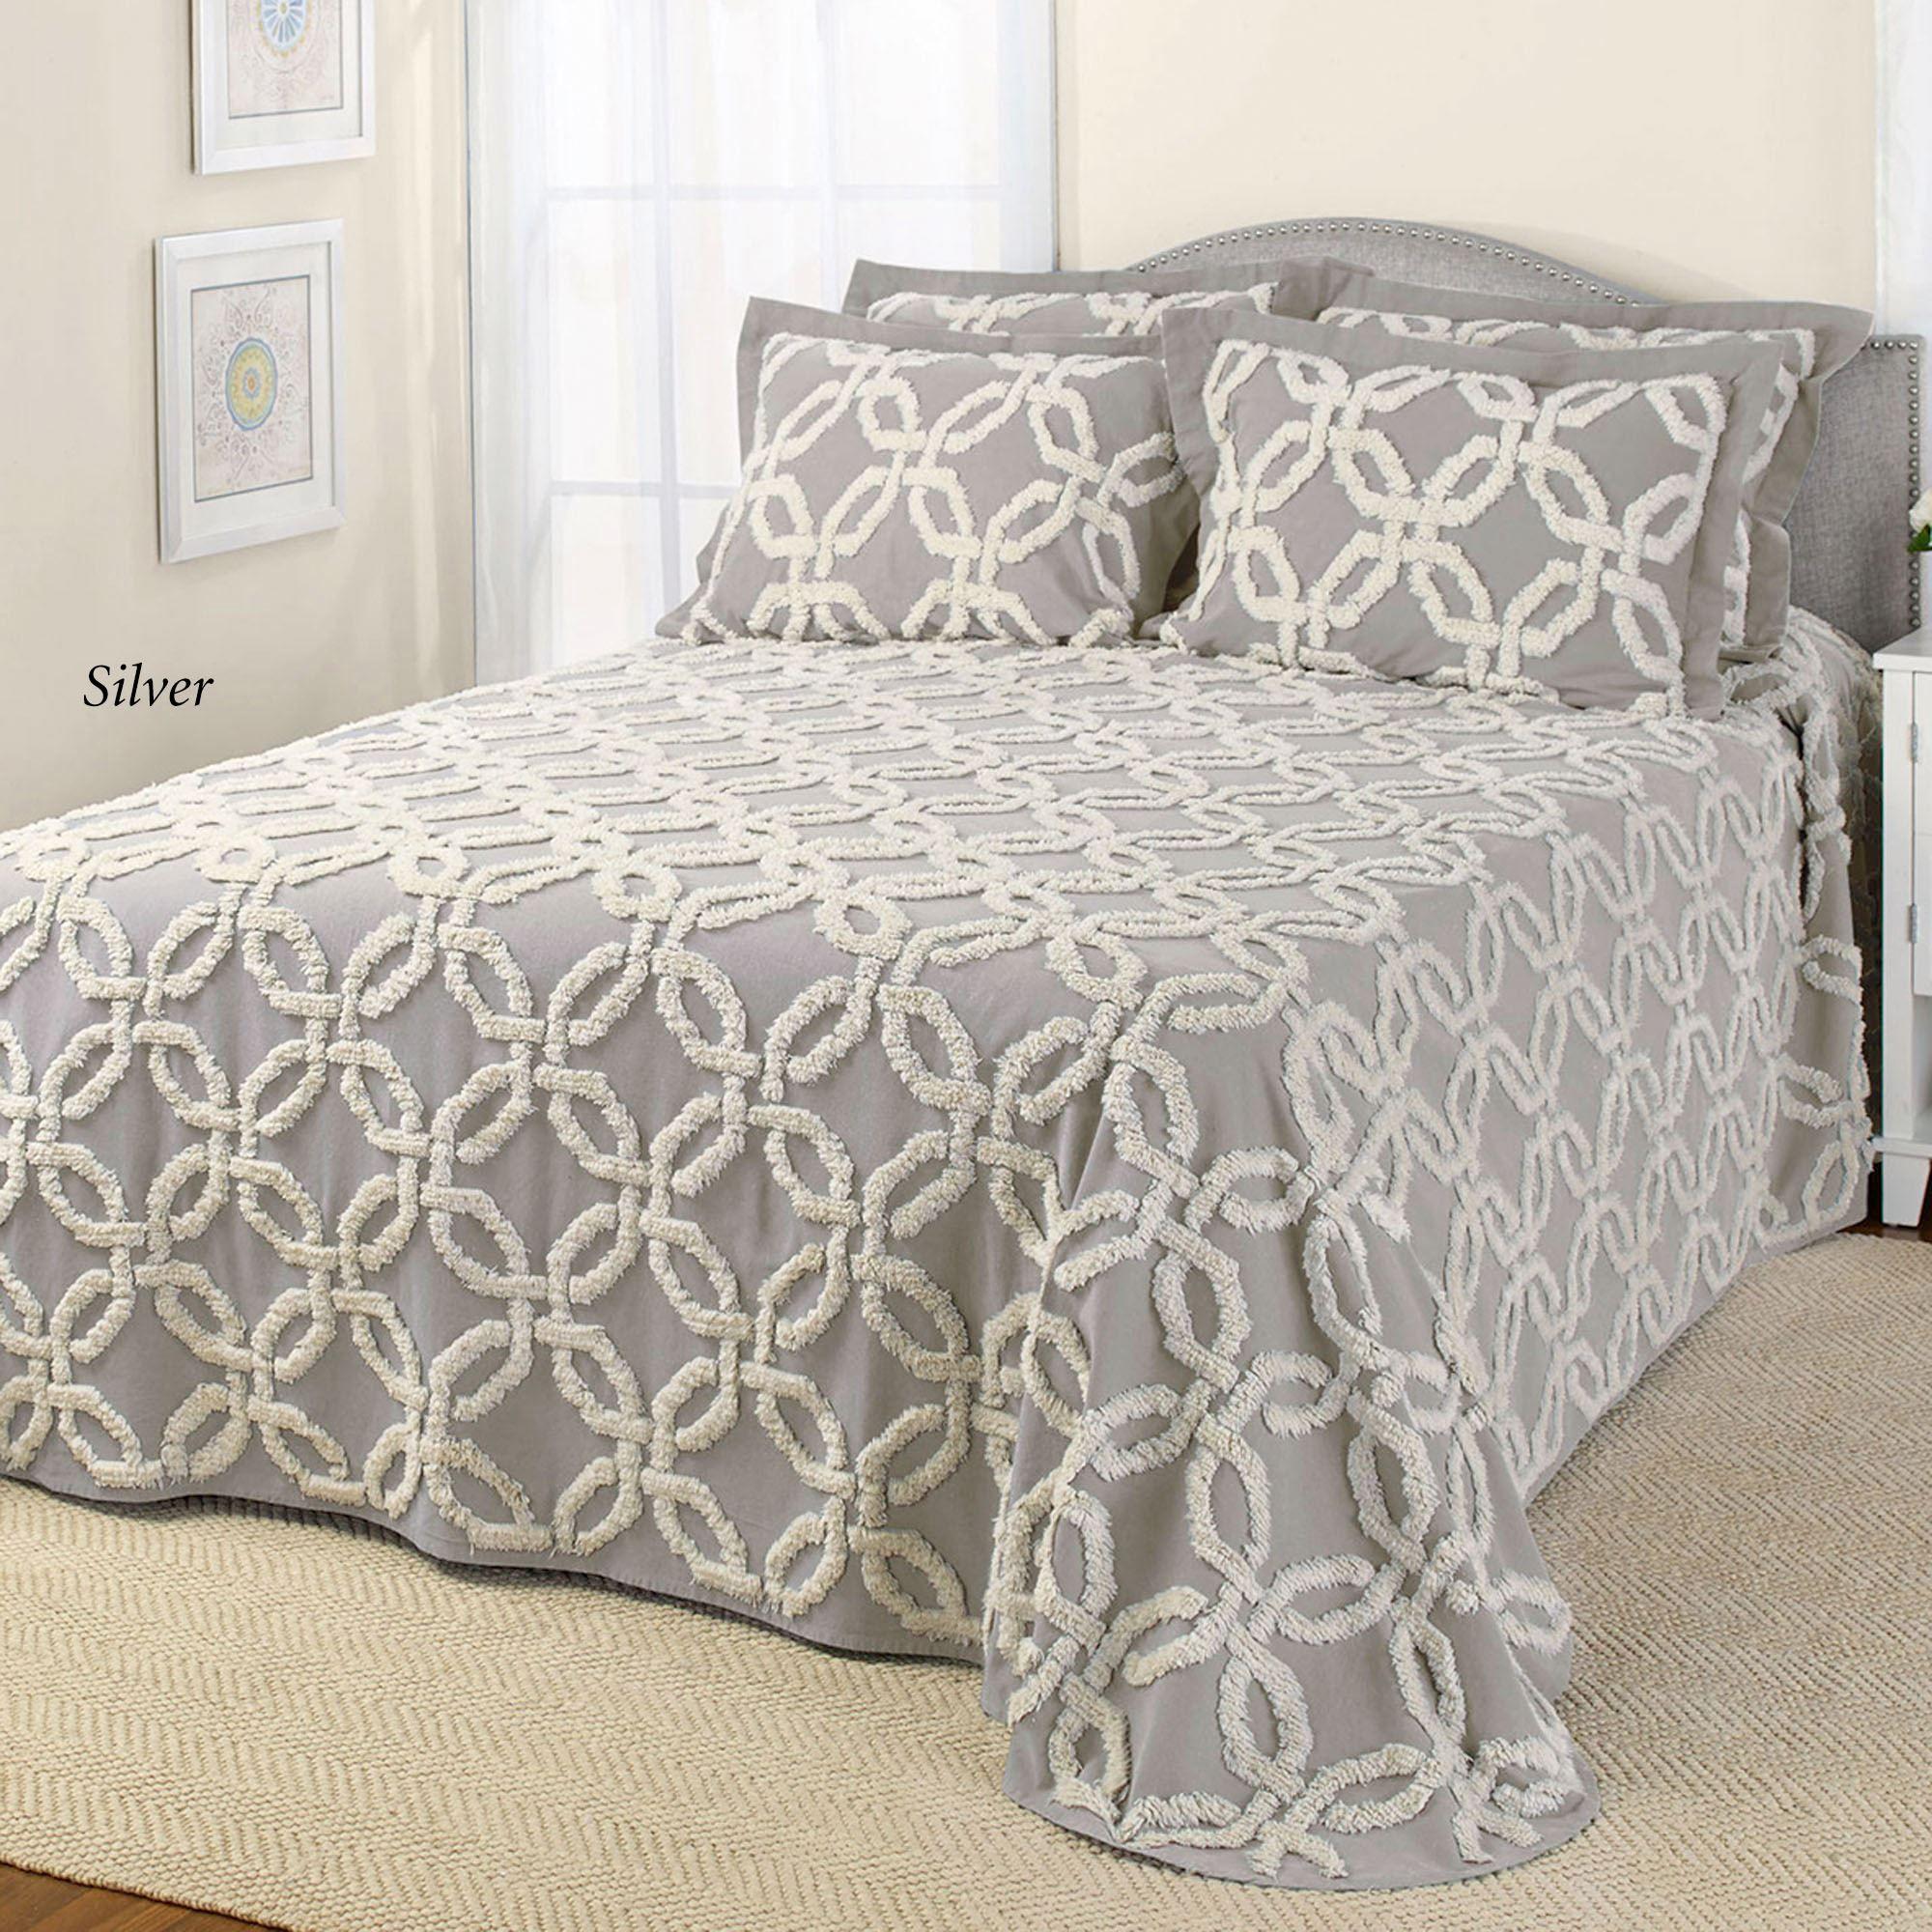 Chenille Bedspreads.Holden Wedding Ring Lightweight Chenille Bedspreads